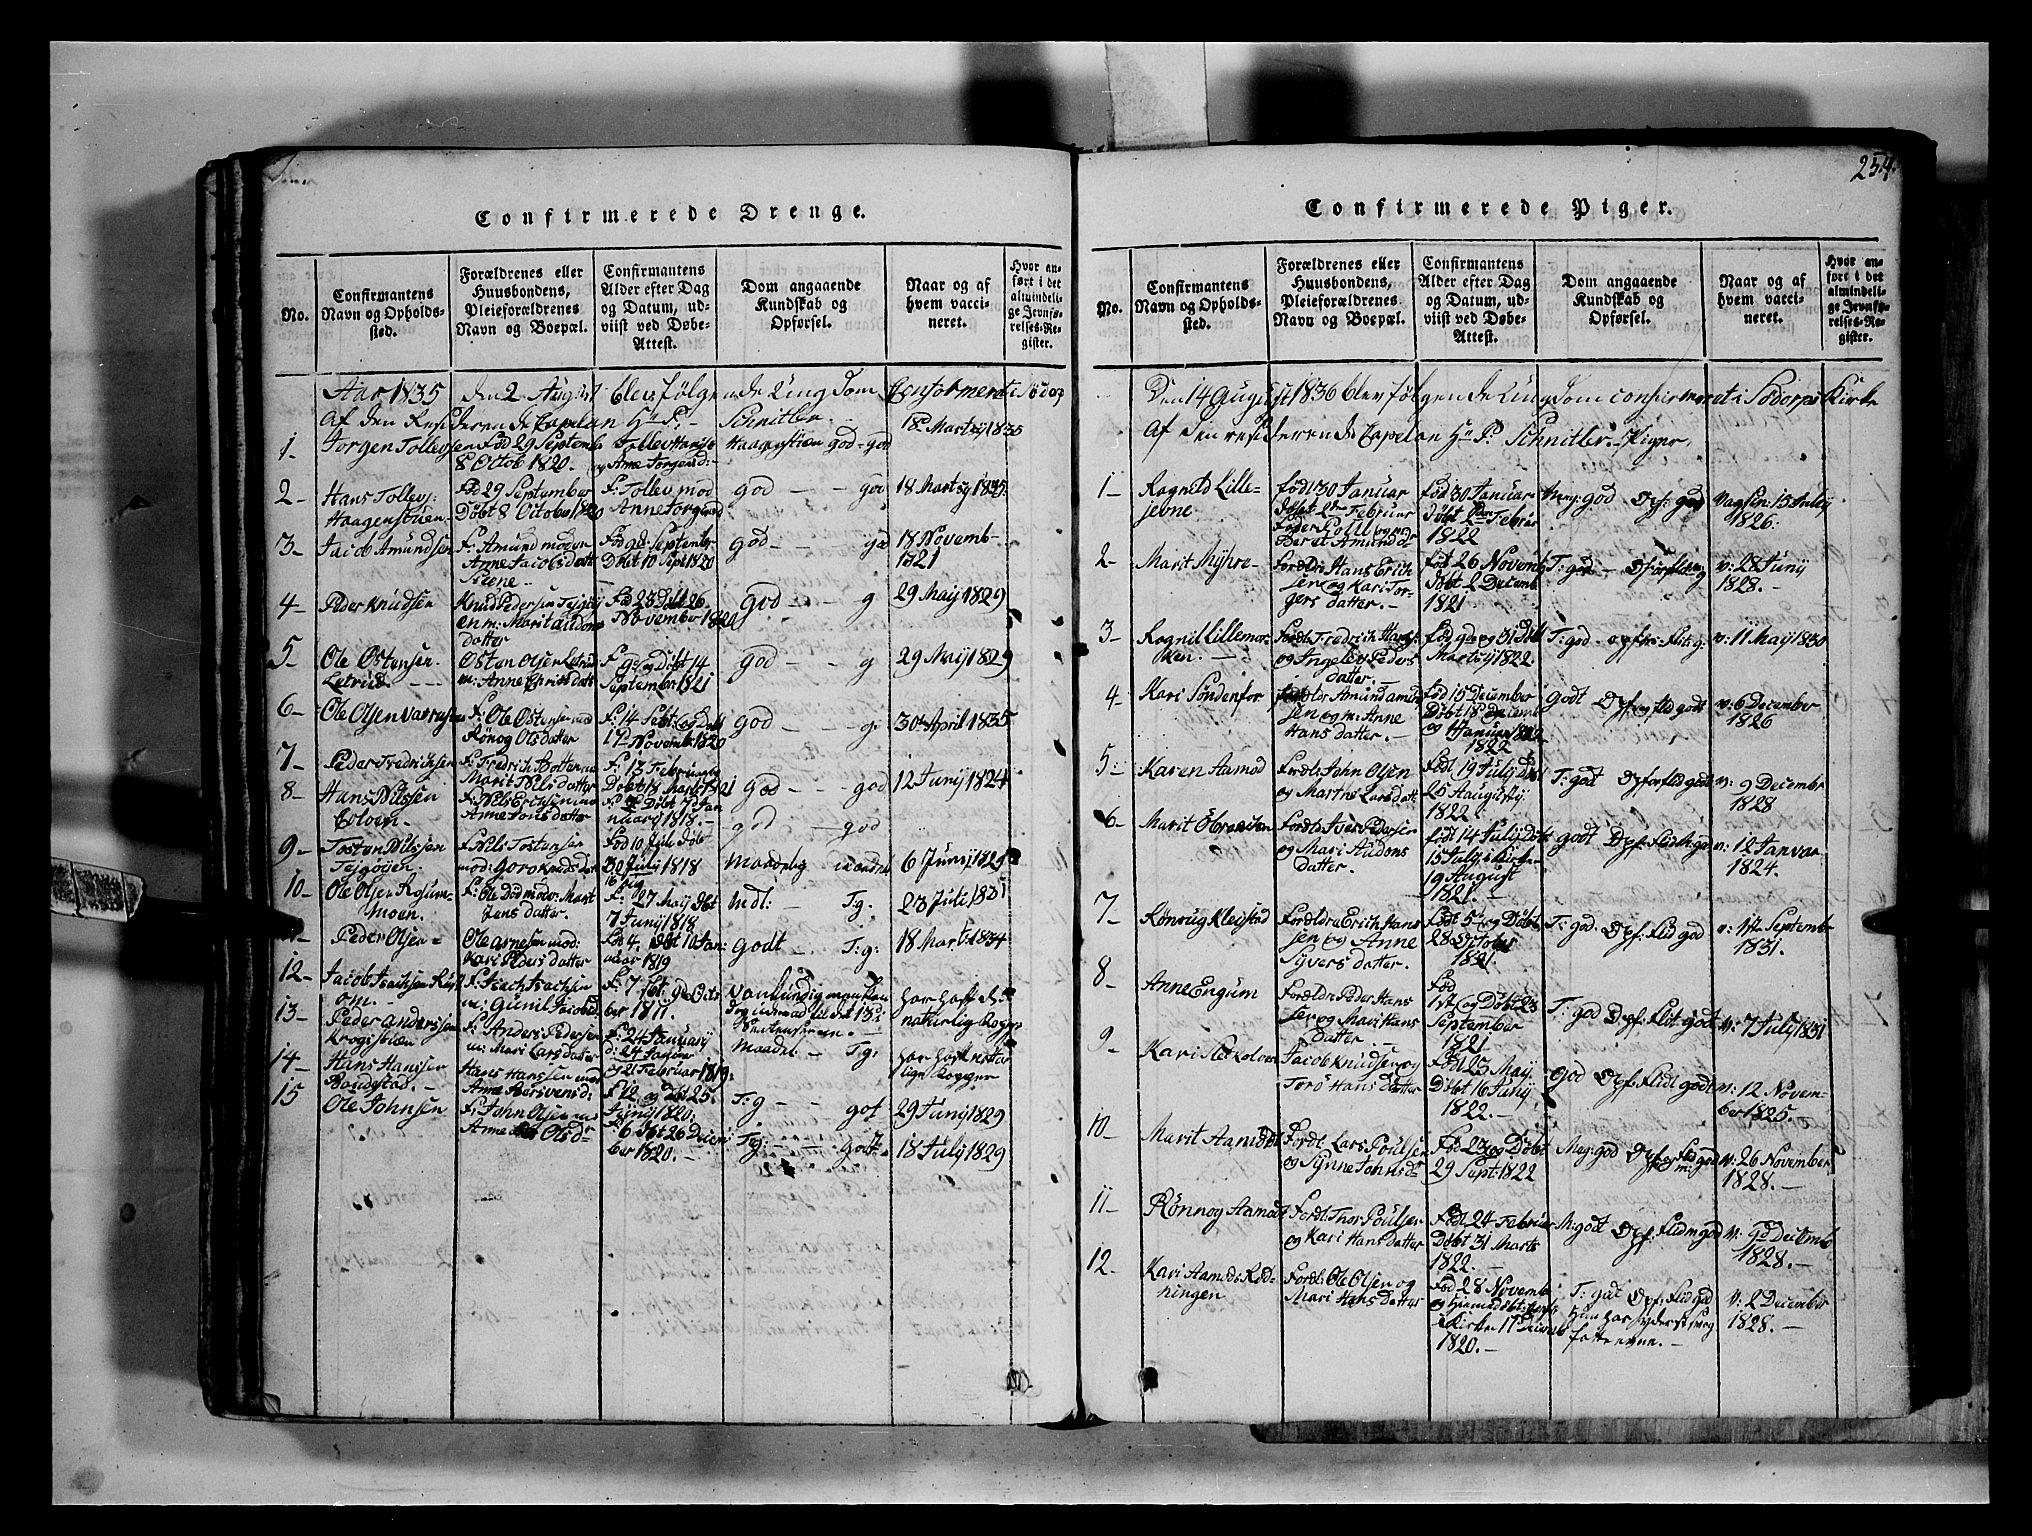 SAH, Fron prestekontor, H/Ha/Hab/L0002: Klokkerbok nr. 2, 1816-1850, s. 254